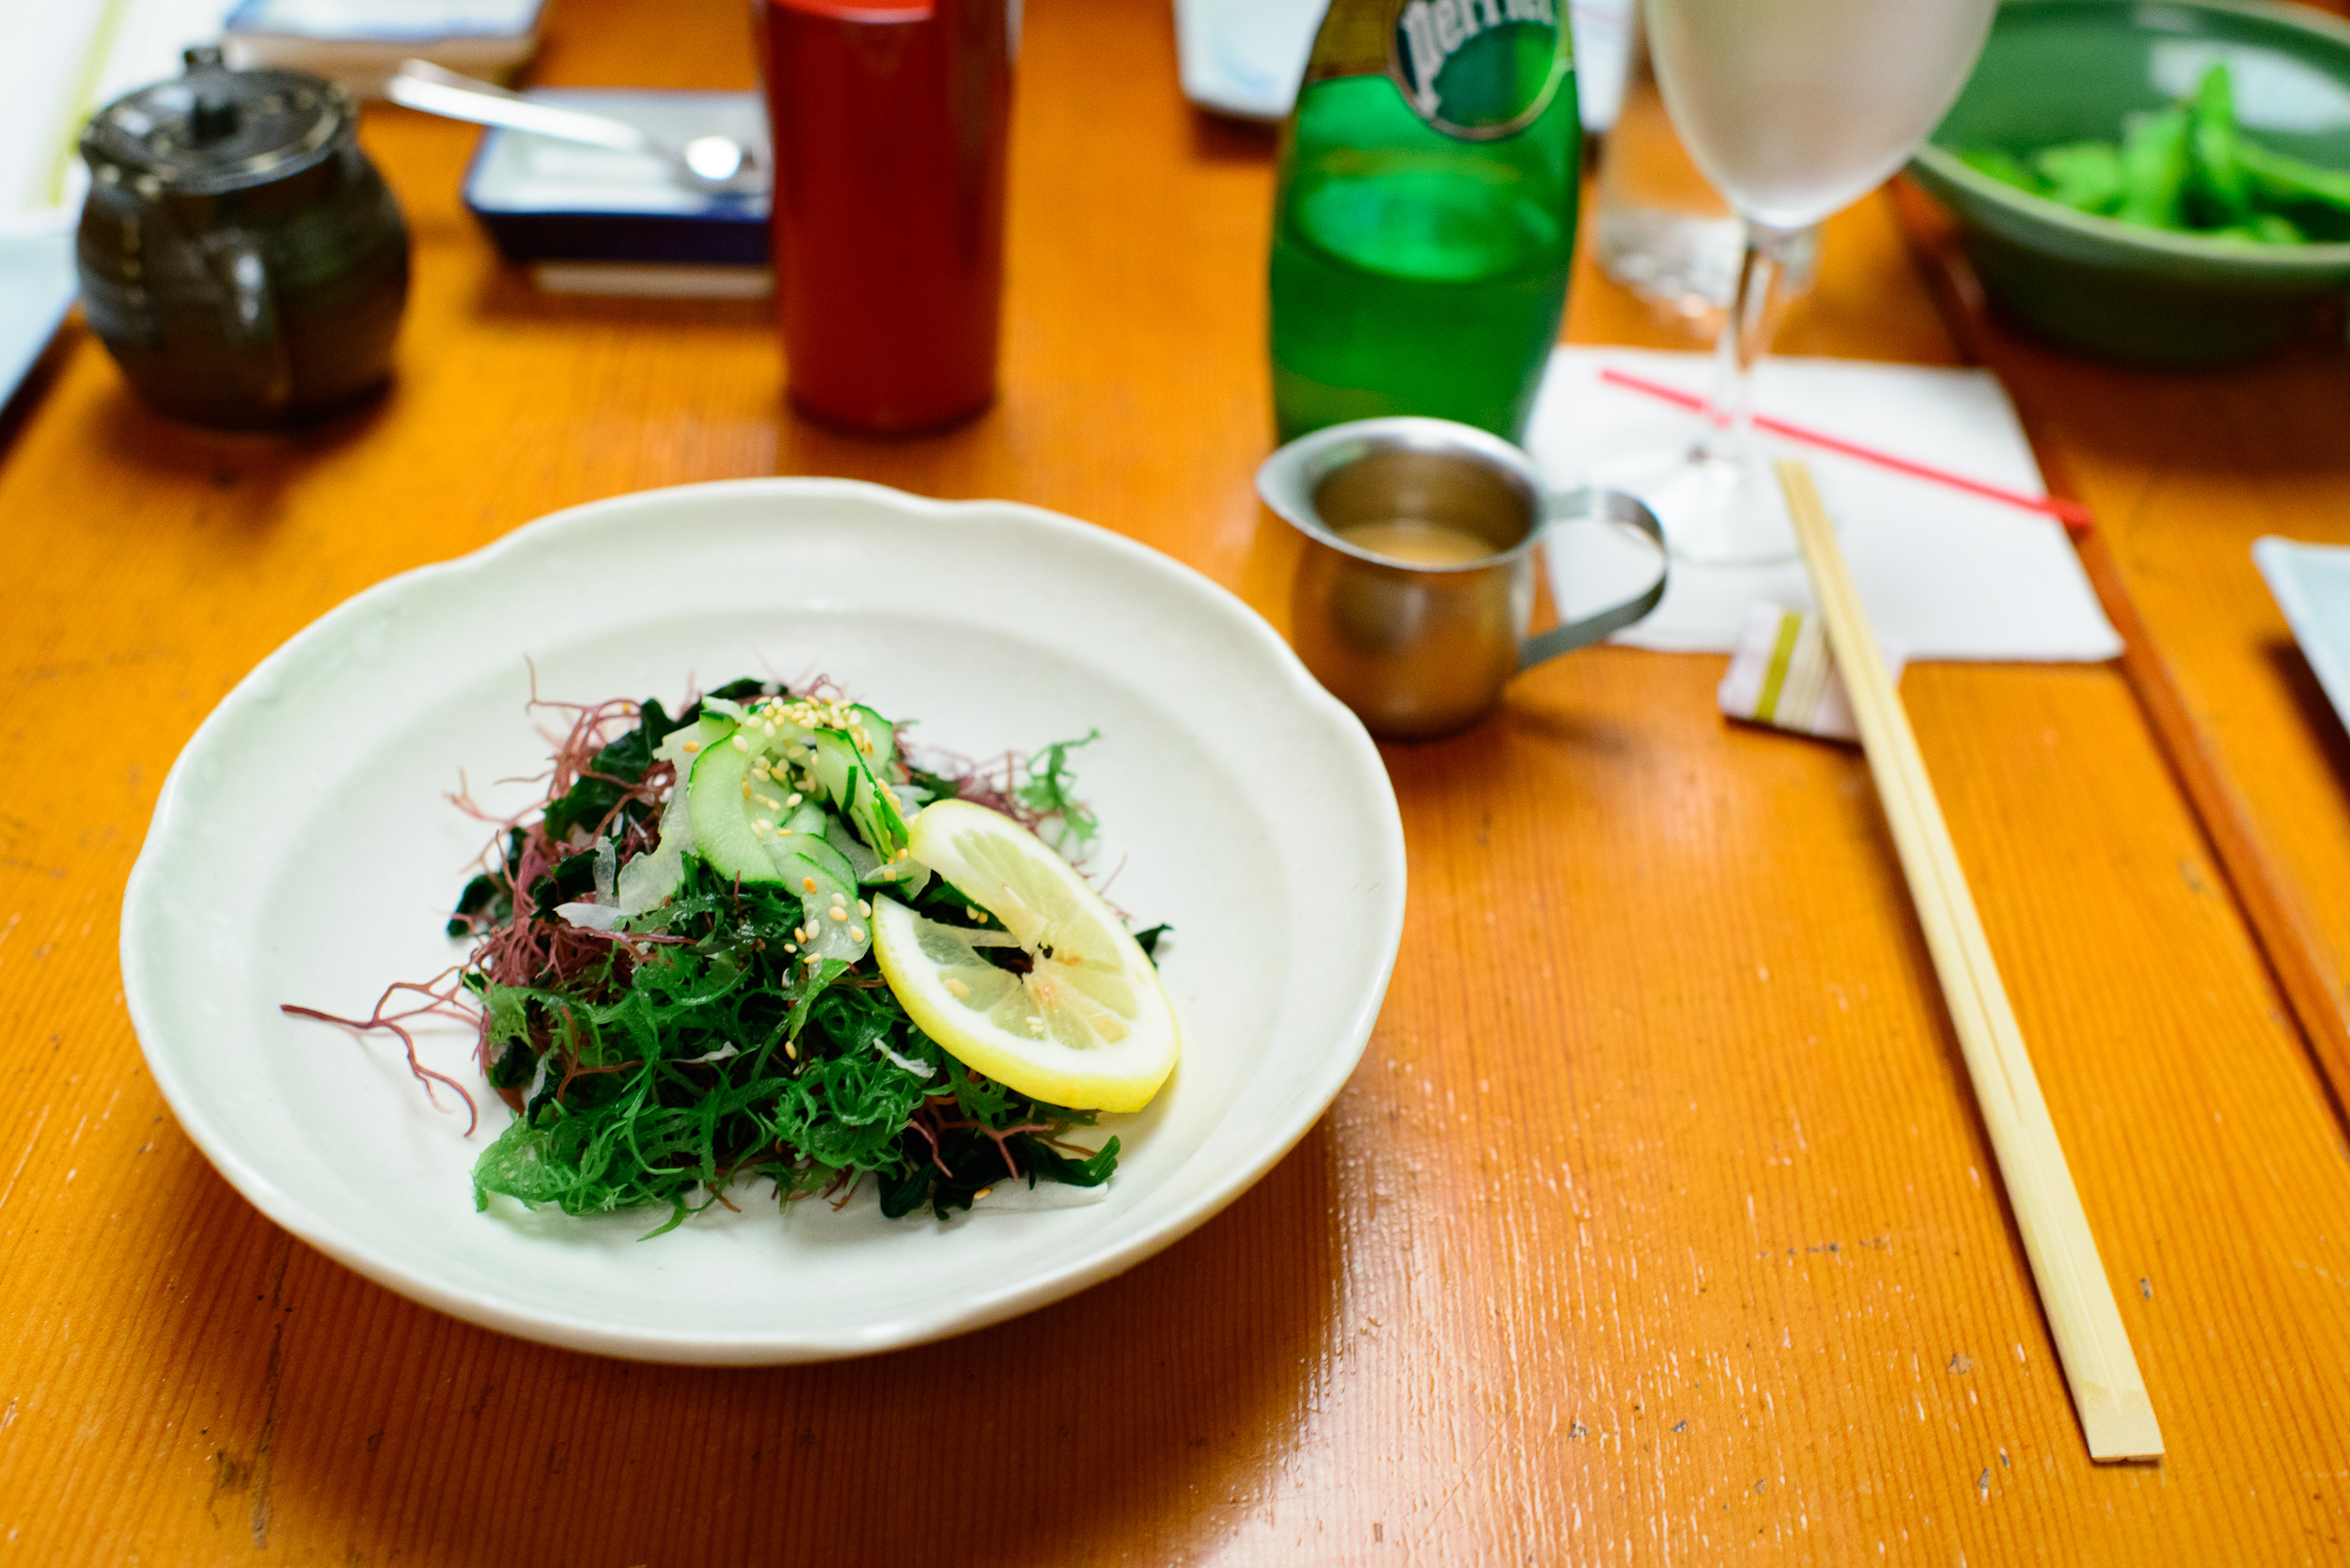 Seaweed salad with sesame dressing